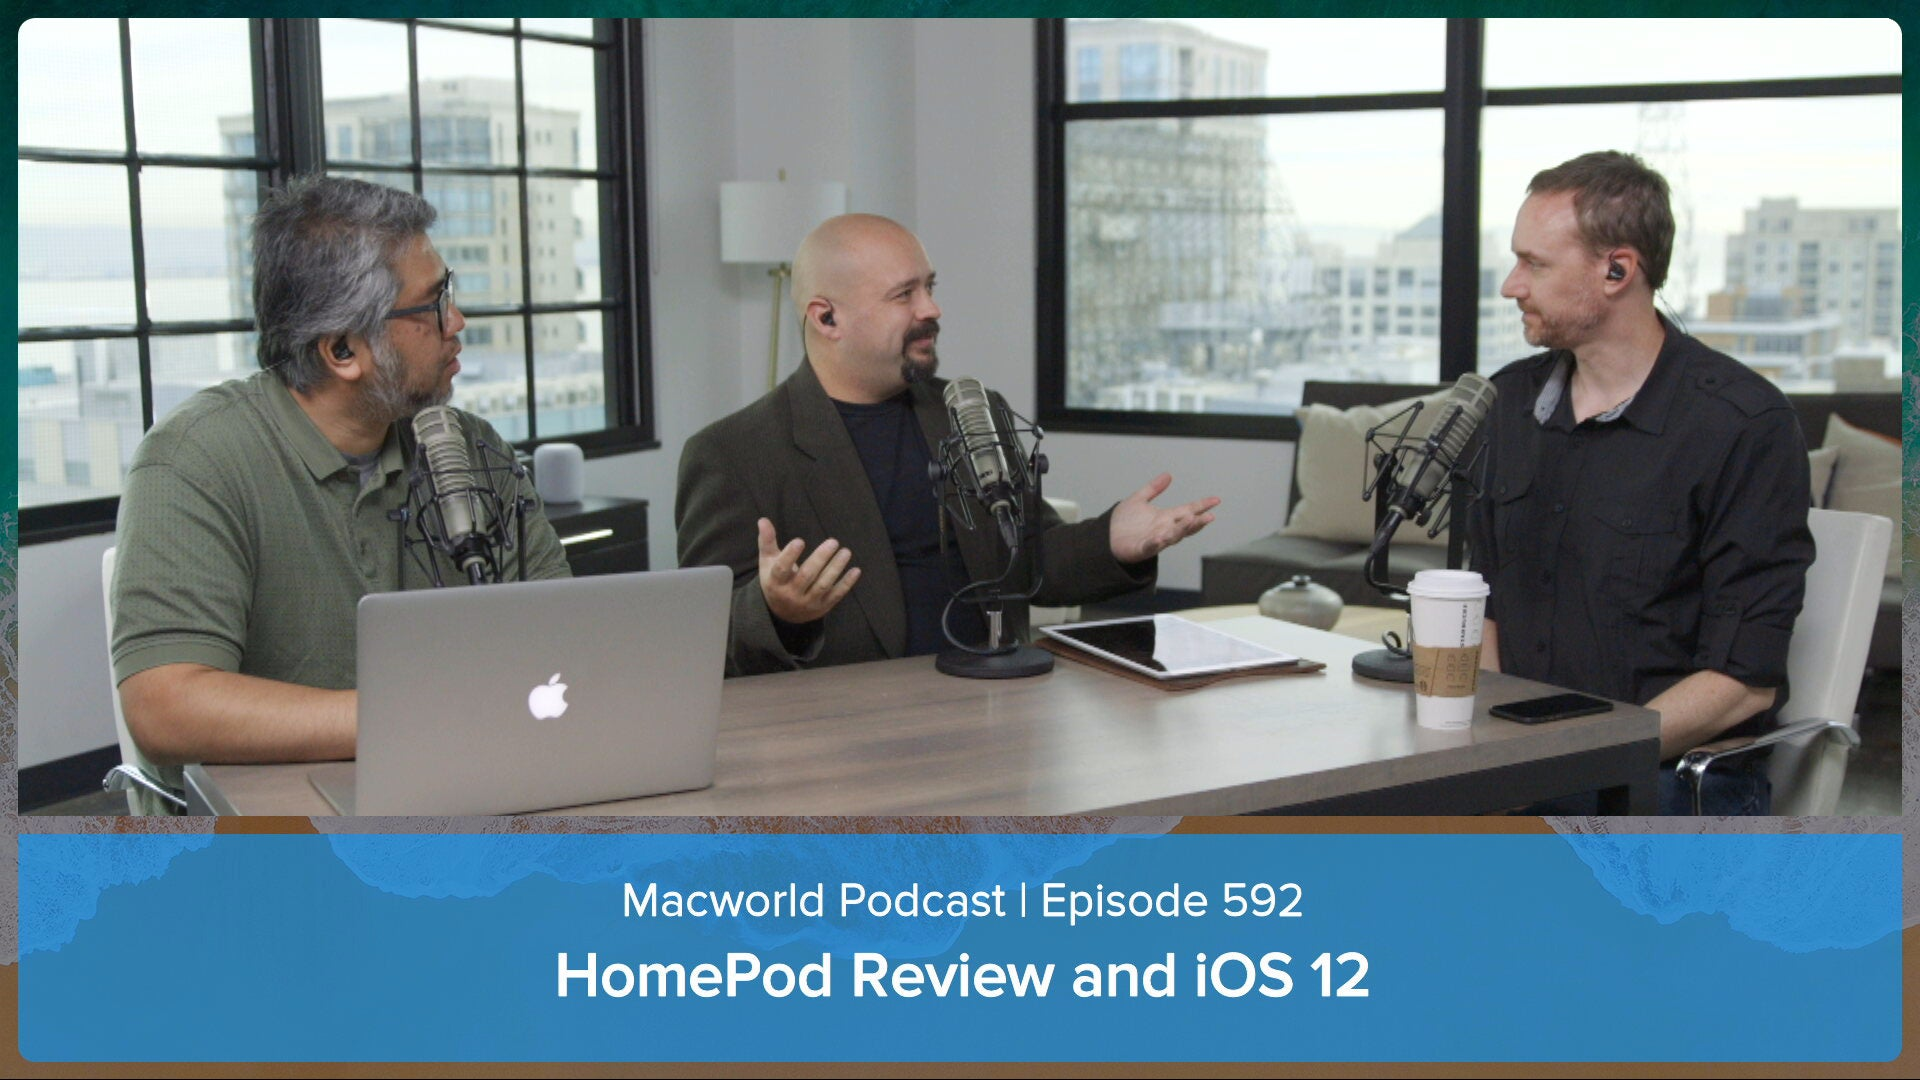 Macworld Podcast 592